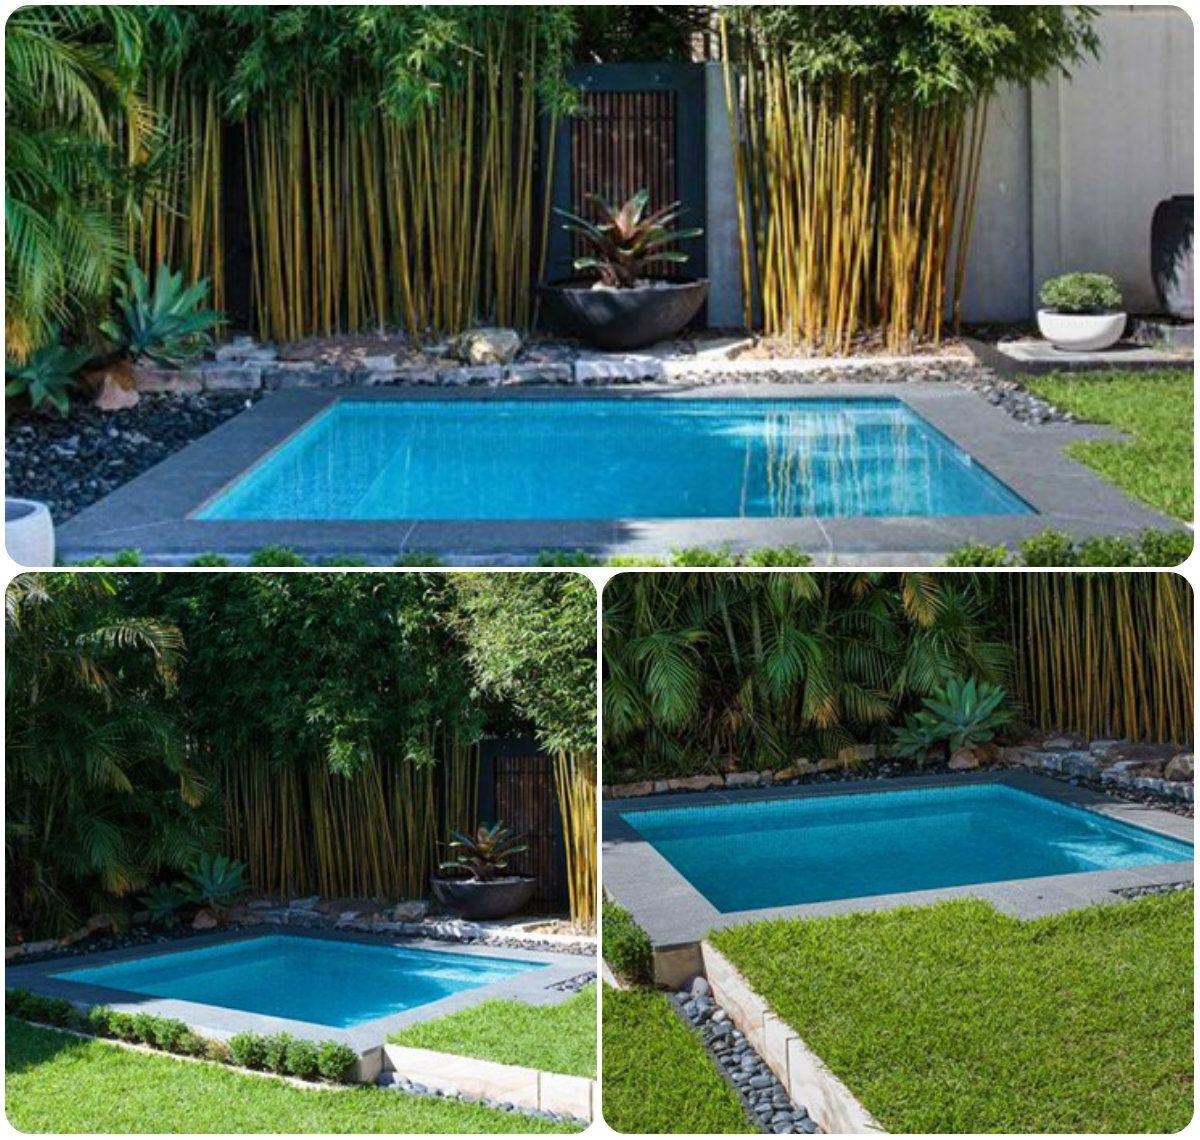 Roseville Plunge Pool Plunge Pool Pool Pool Designs